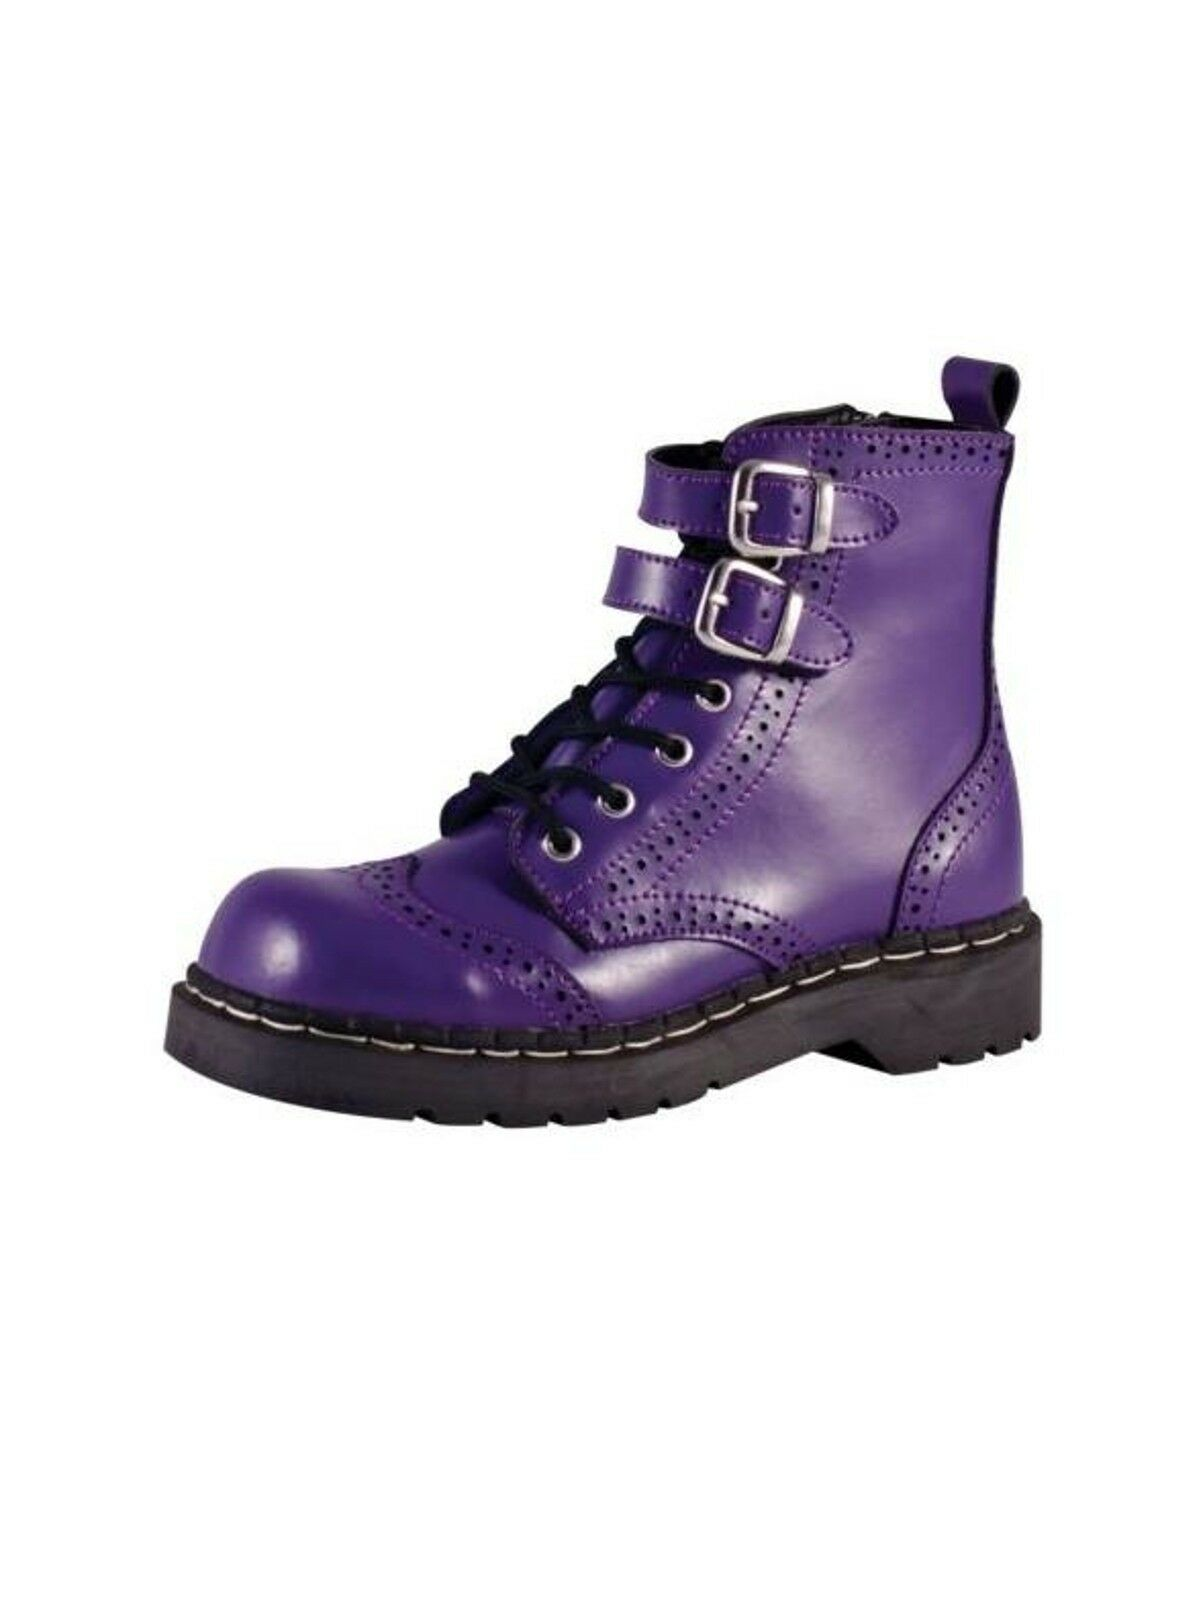 T.U.K./Tuk anarchic botas Boot Budapester hebilla lila violeta t2184